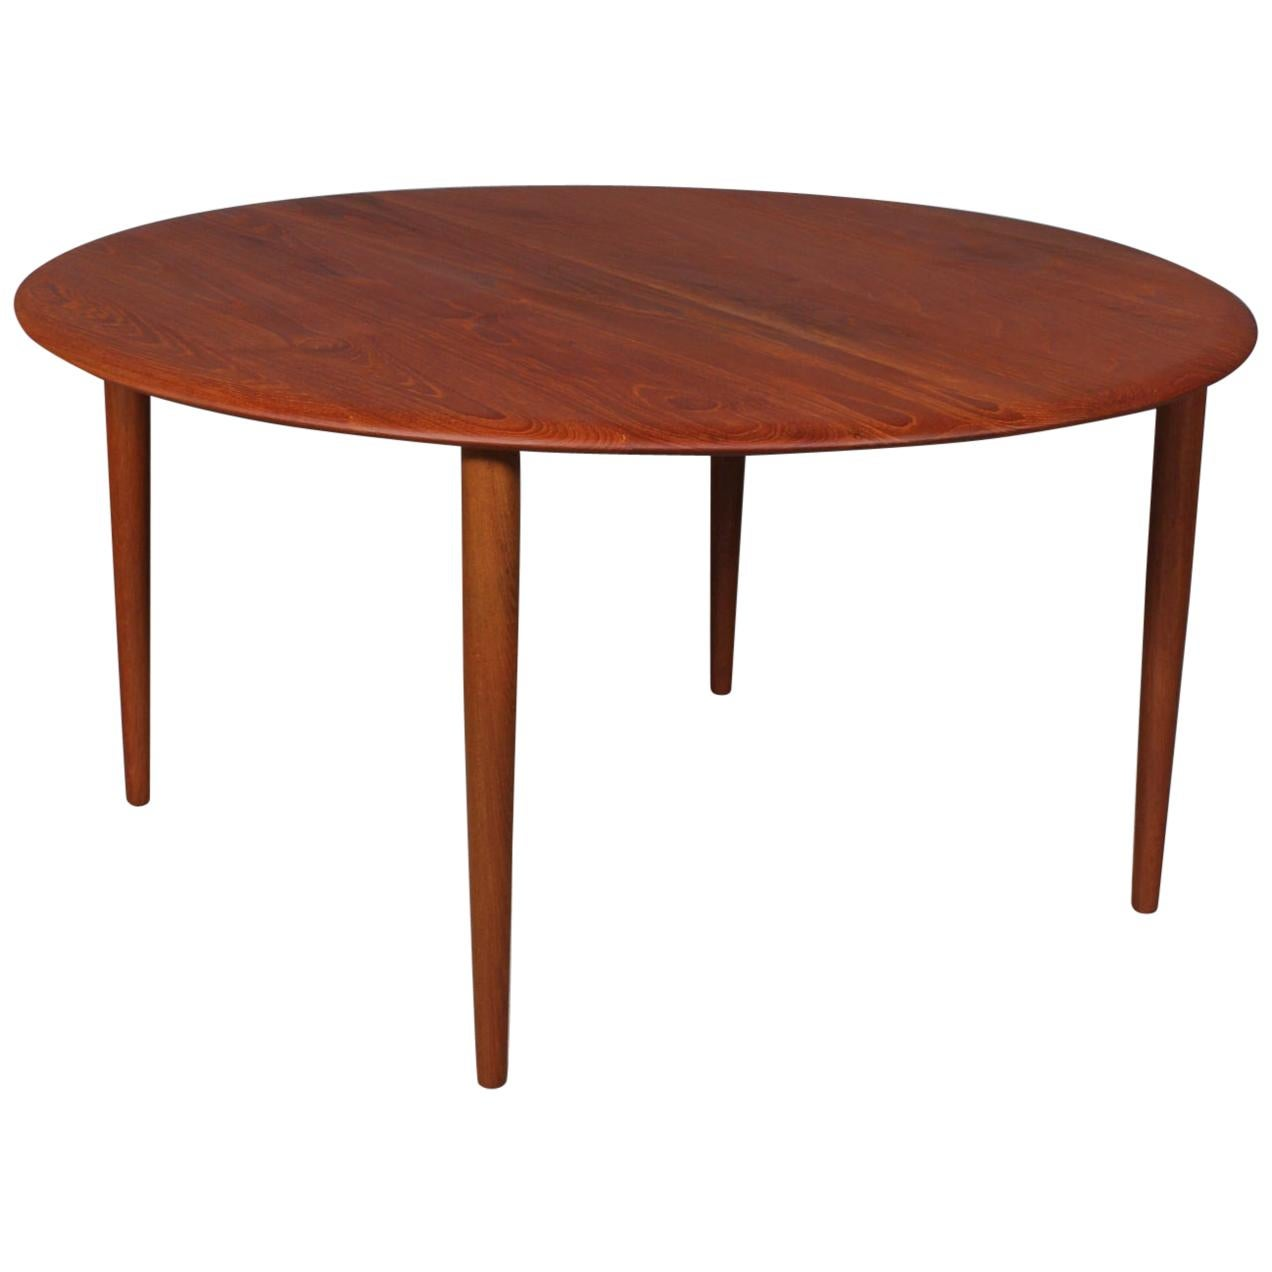 Peter Hvidt & Orla Mølgaard-Nielsen Sofa Table